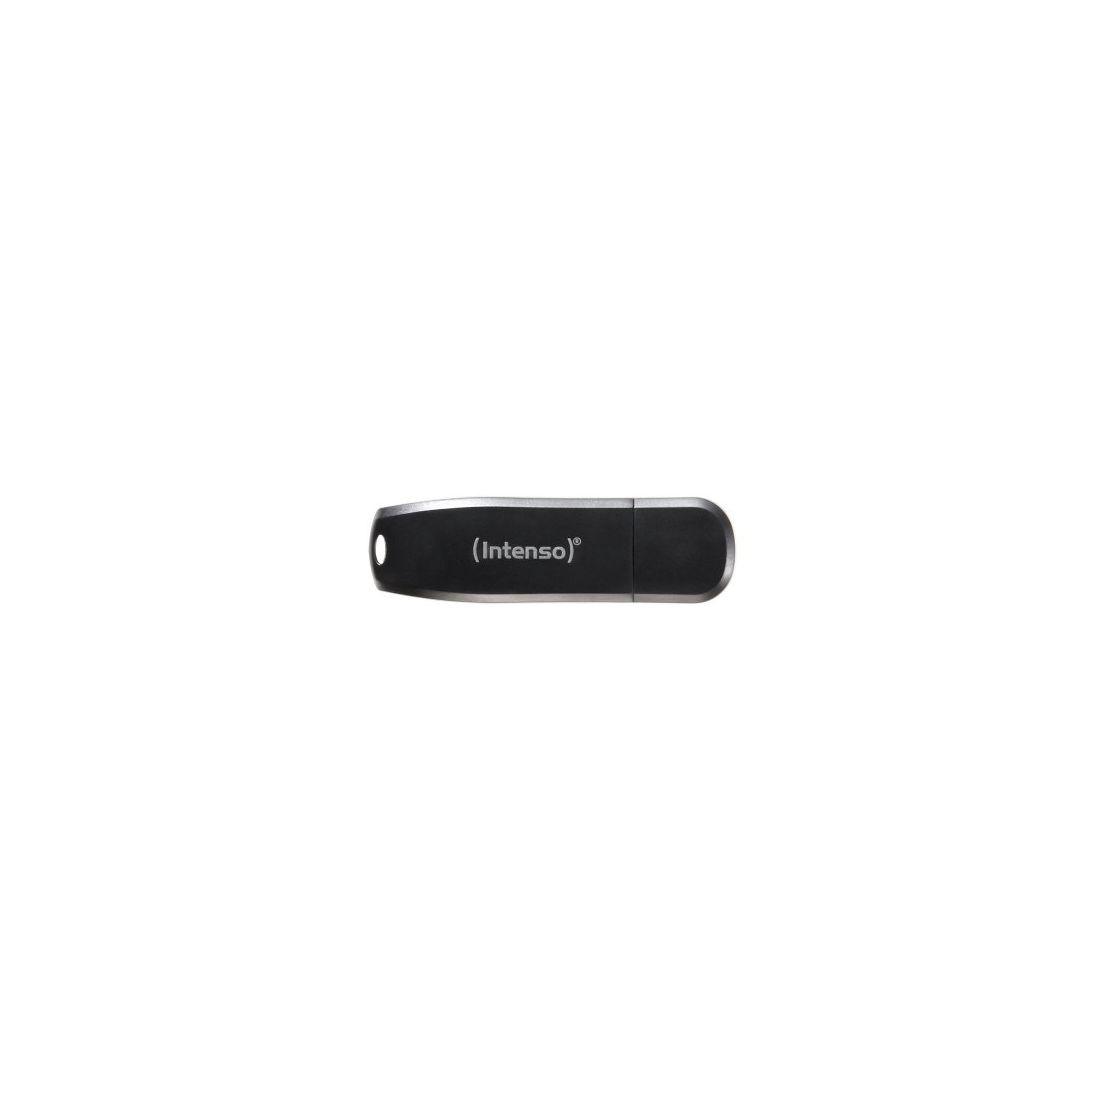 Intenso 3533492 Lapiz USB 30 Speed 256GB